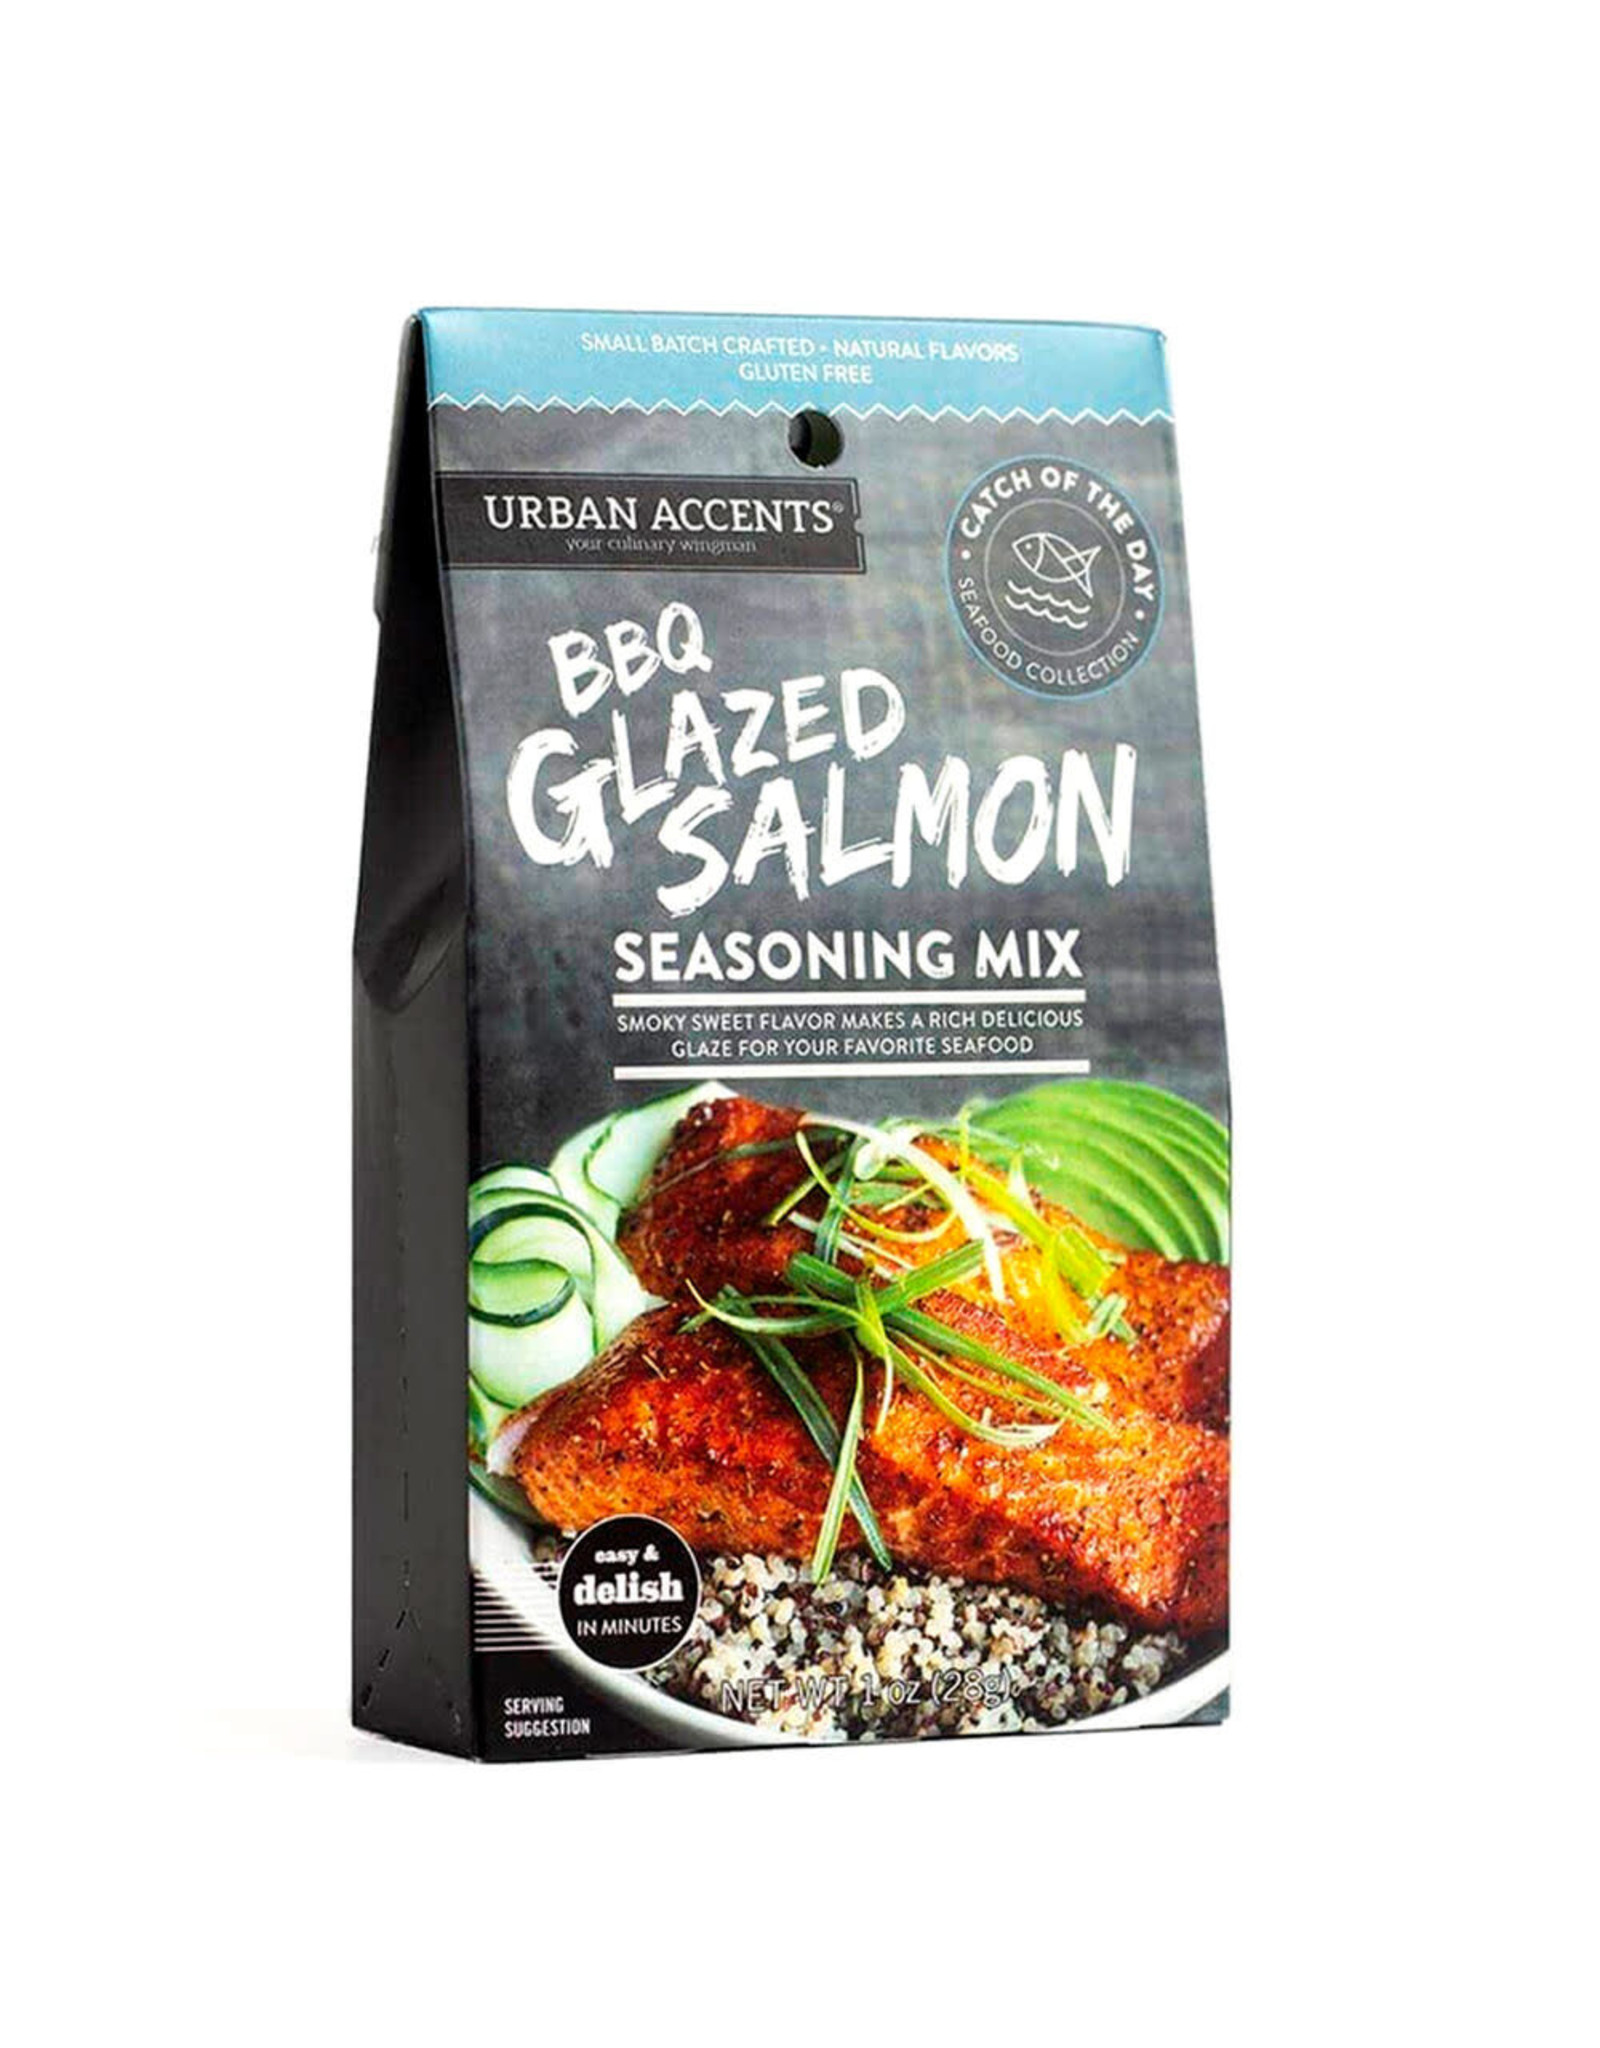 Urban Accents BBQ GLAZED SALMON SEASONING MIX